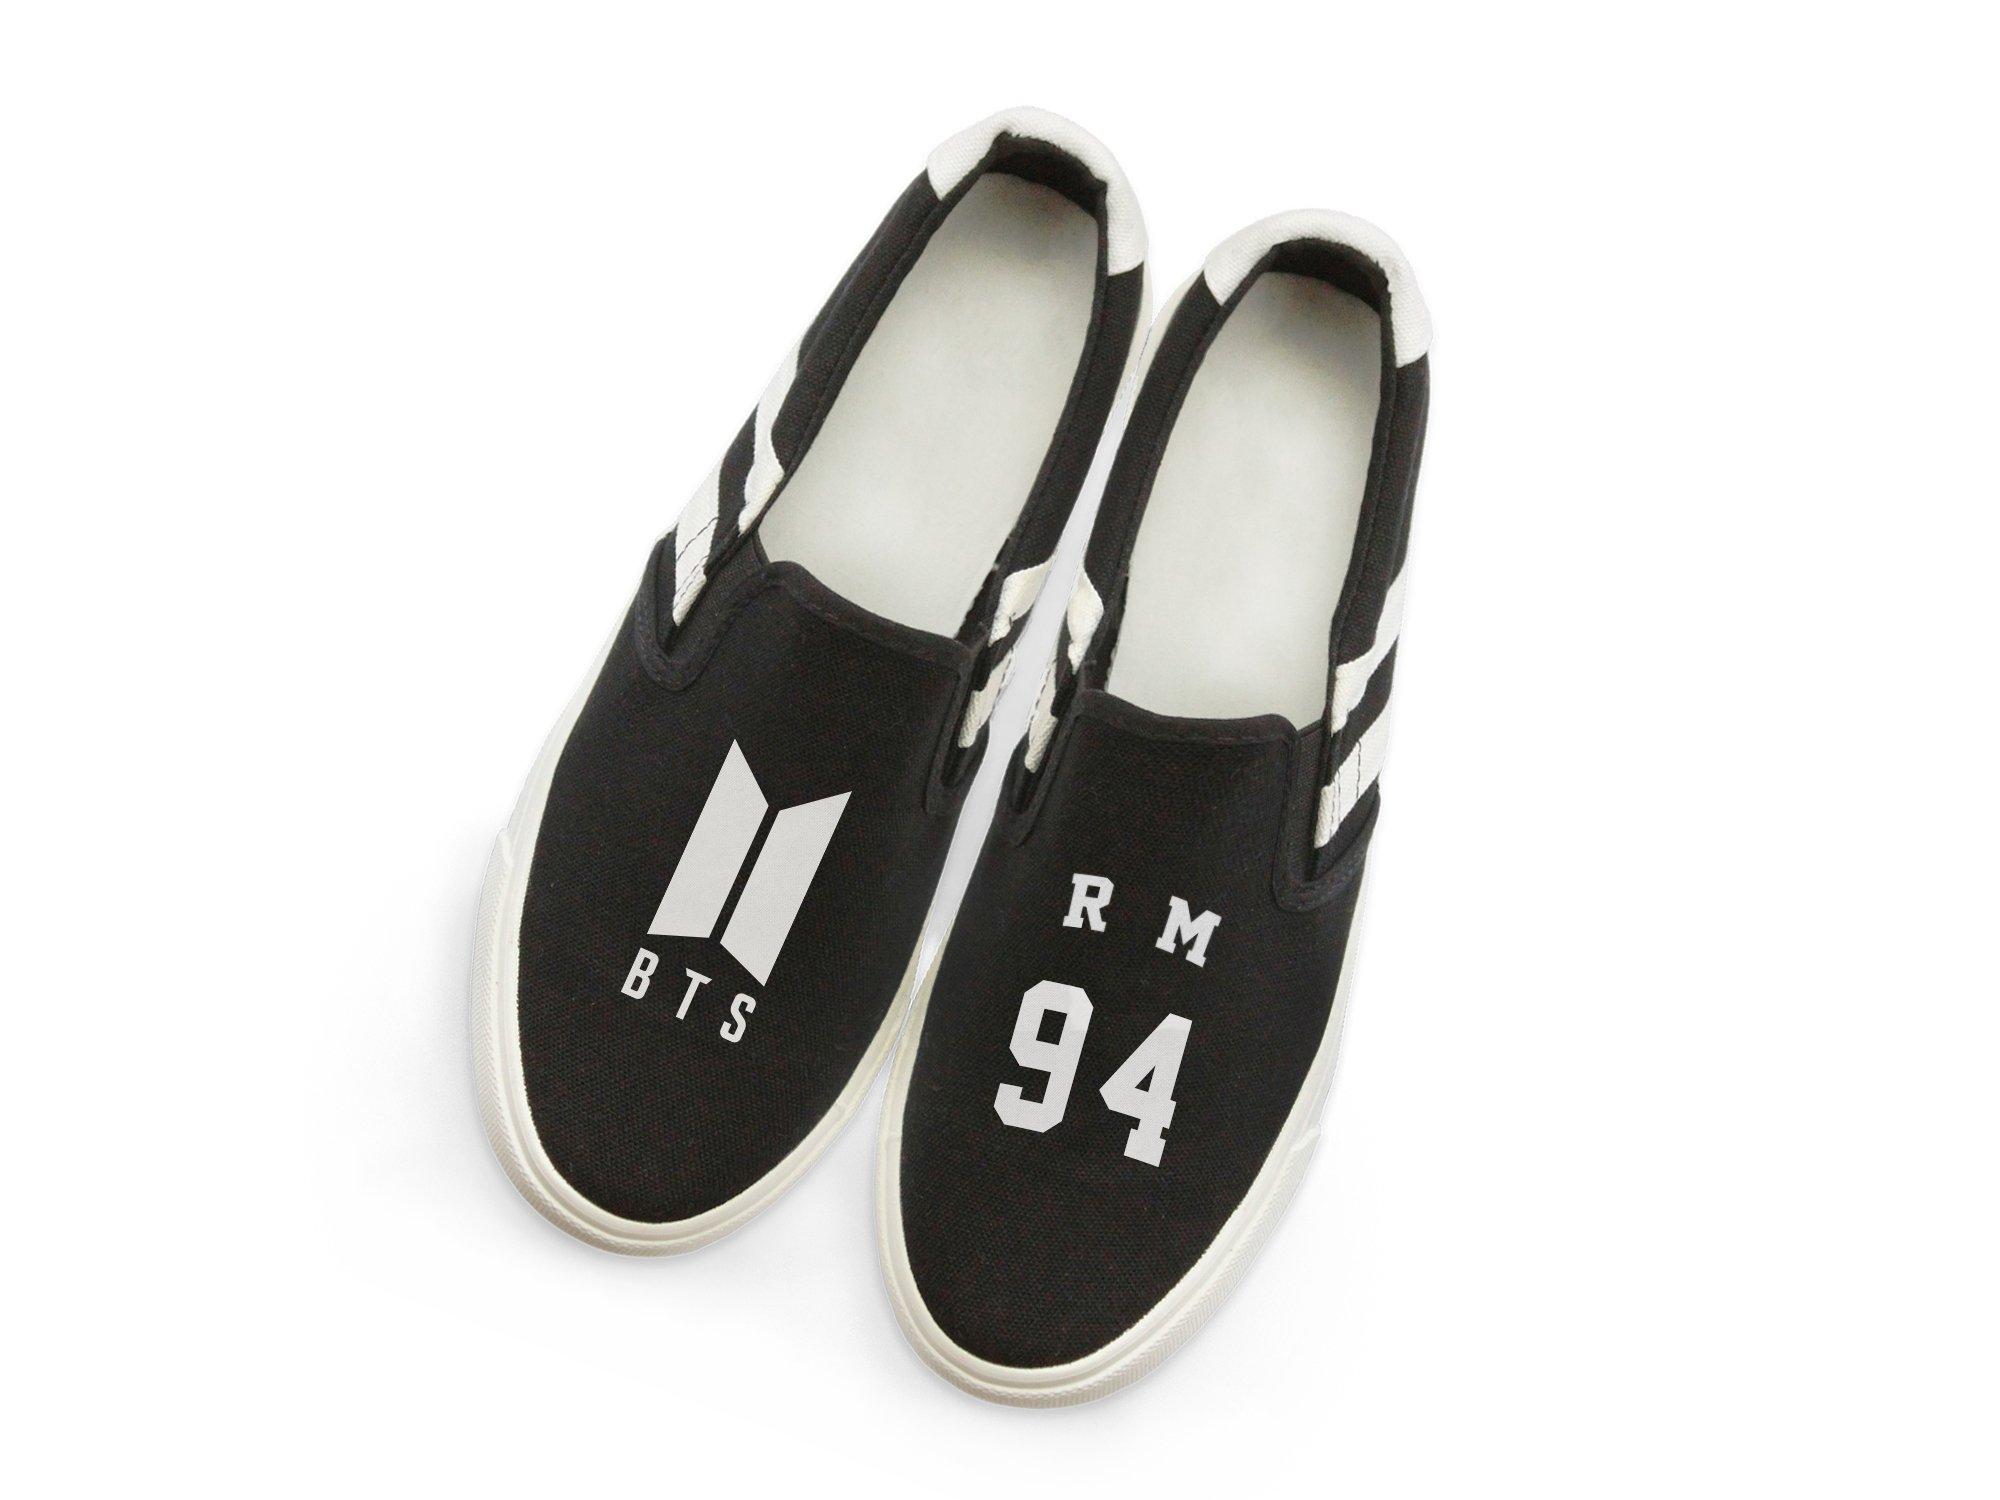 Fanstown BTS Kpop Sneakers Shoes Fanshion Memeber Hiphop Style Fan Support V Suga Junkkook with lomo Card (7.5, Rap Monster B)